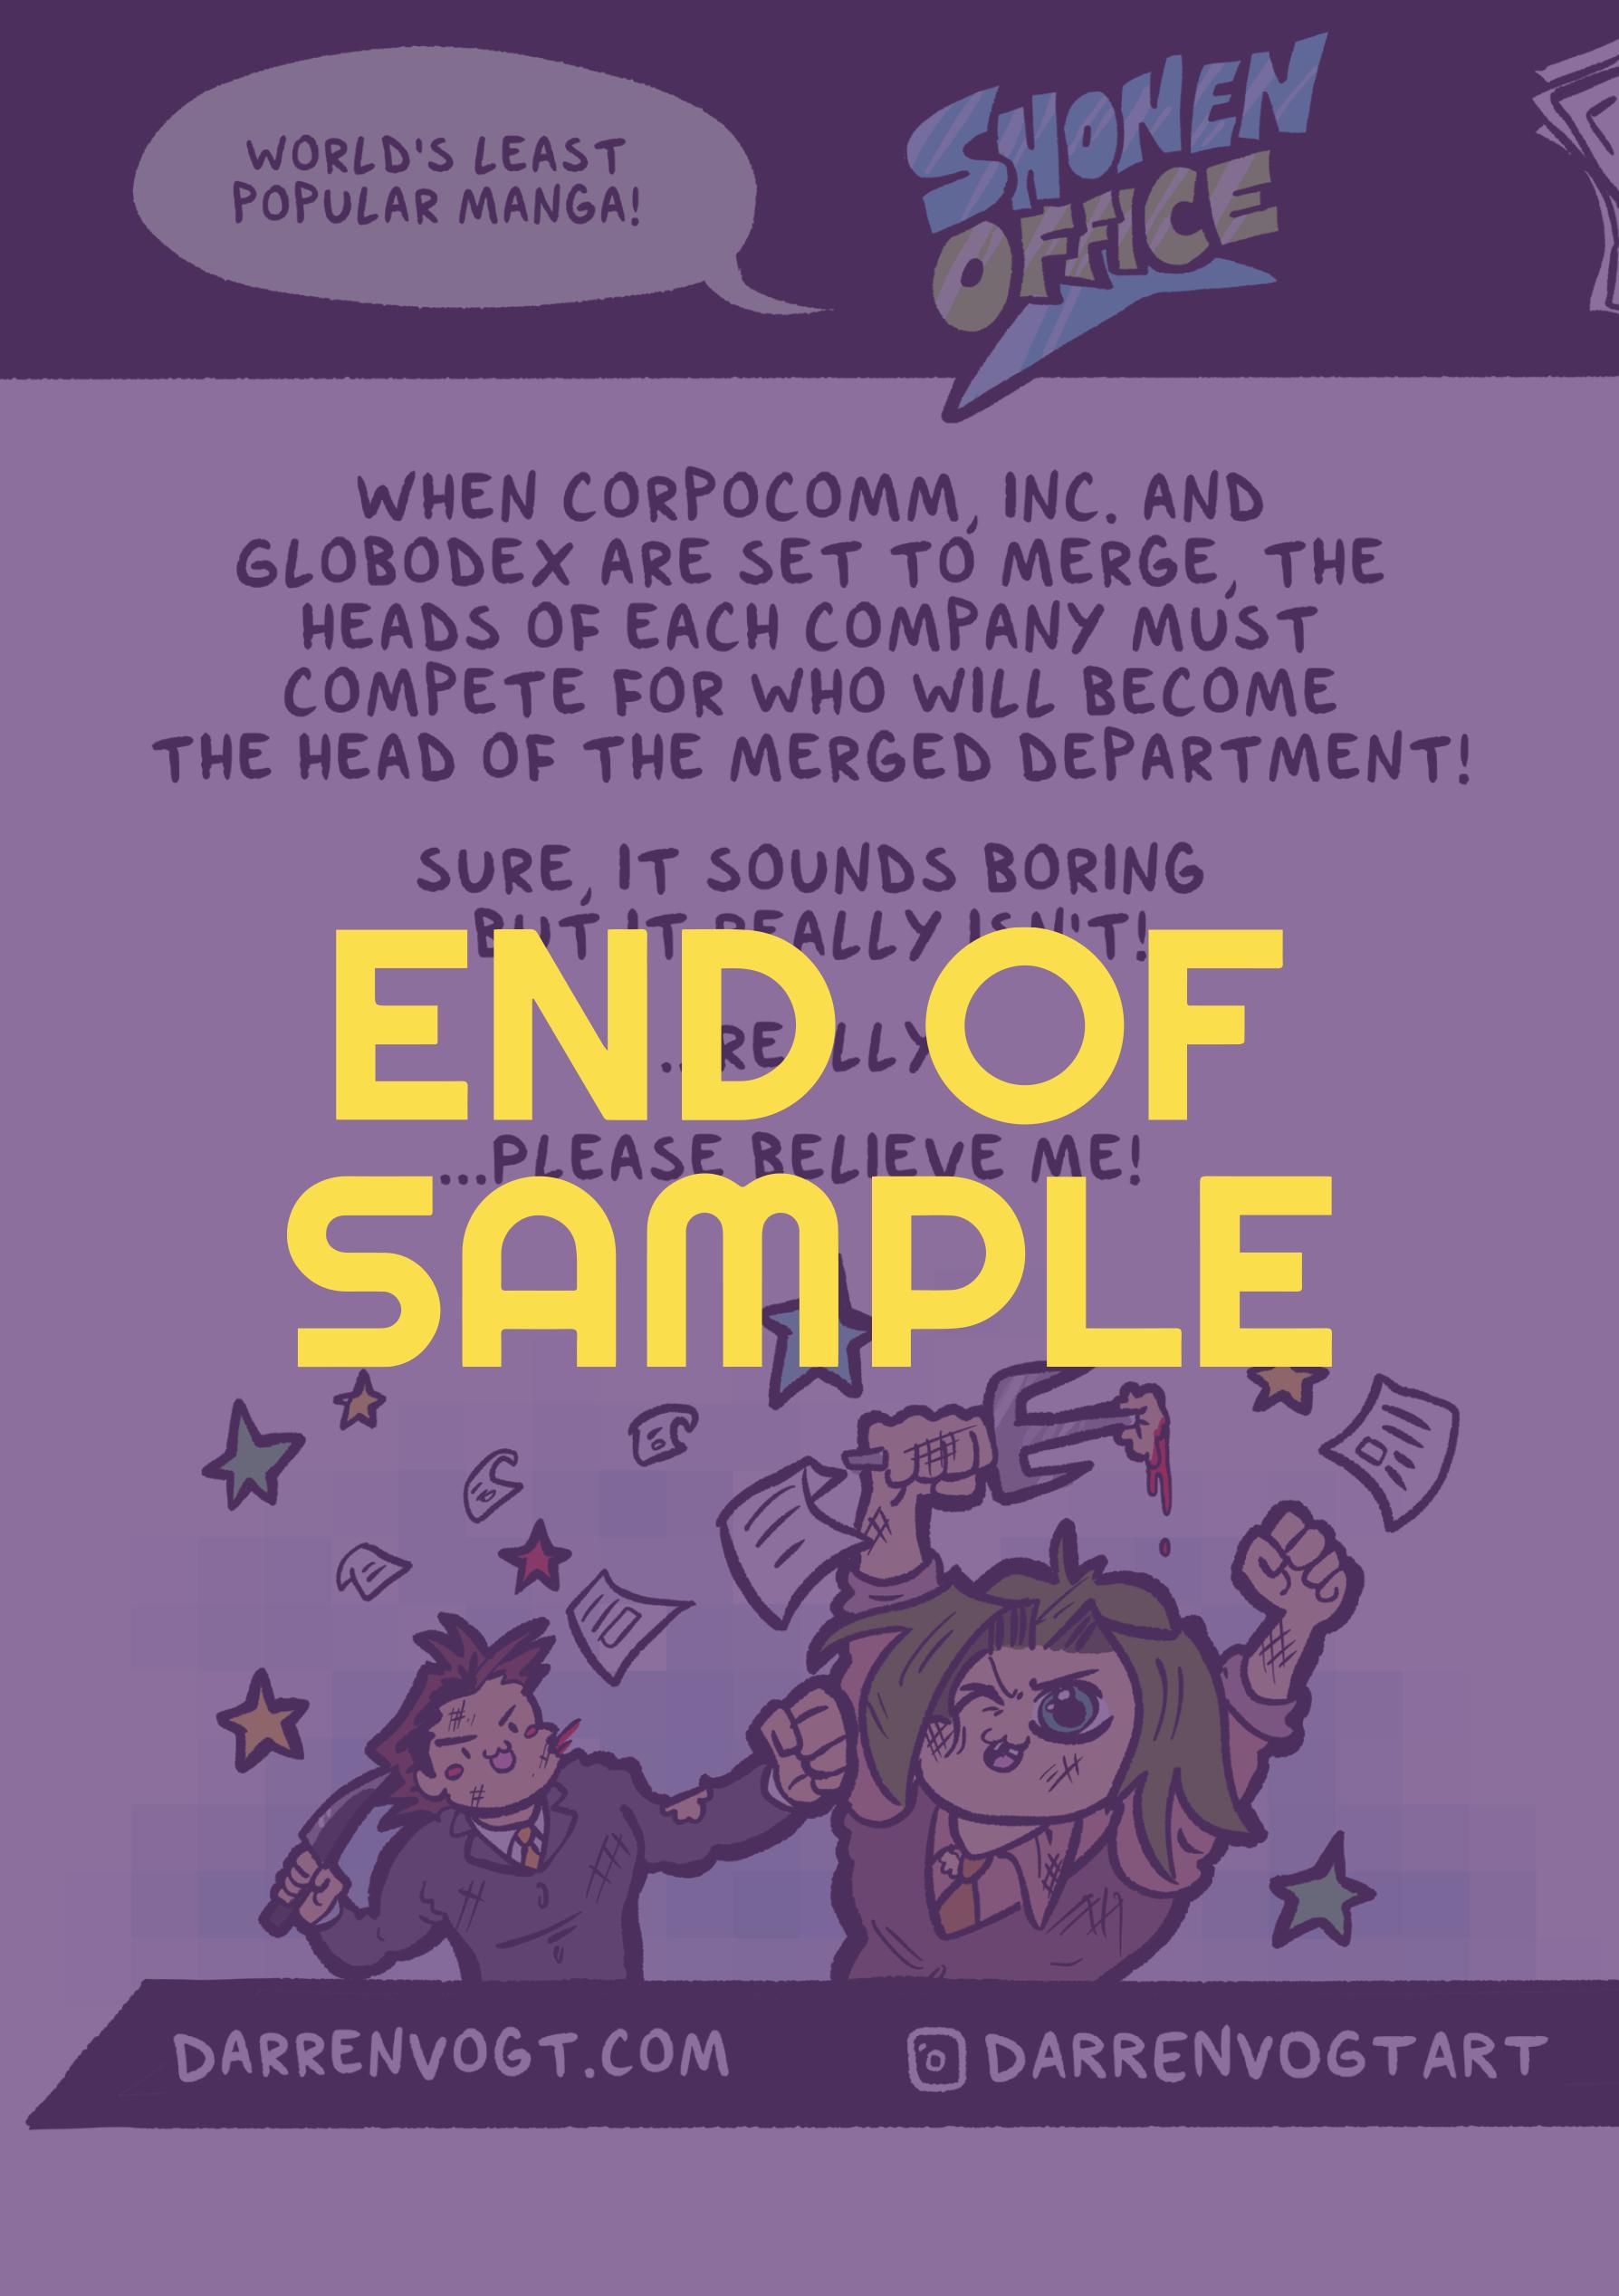 Shonen-Office-Complete-site-samples-back-end